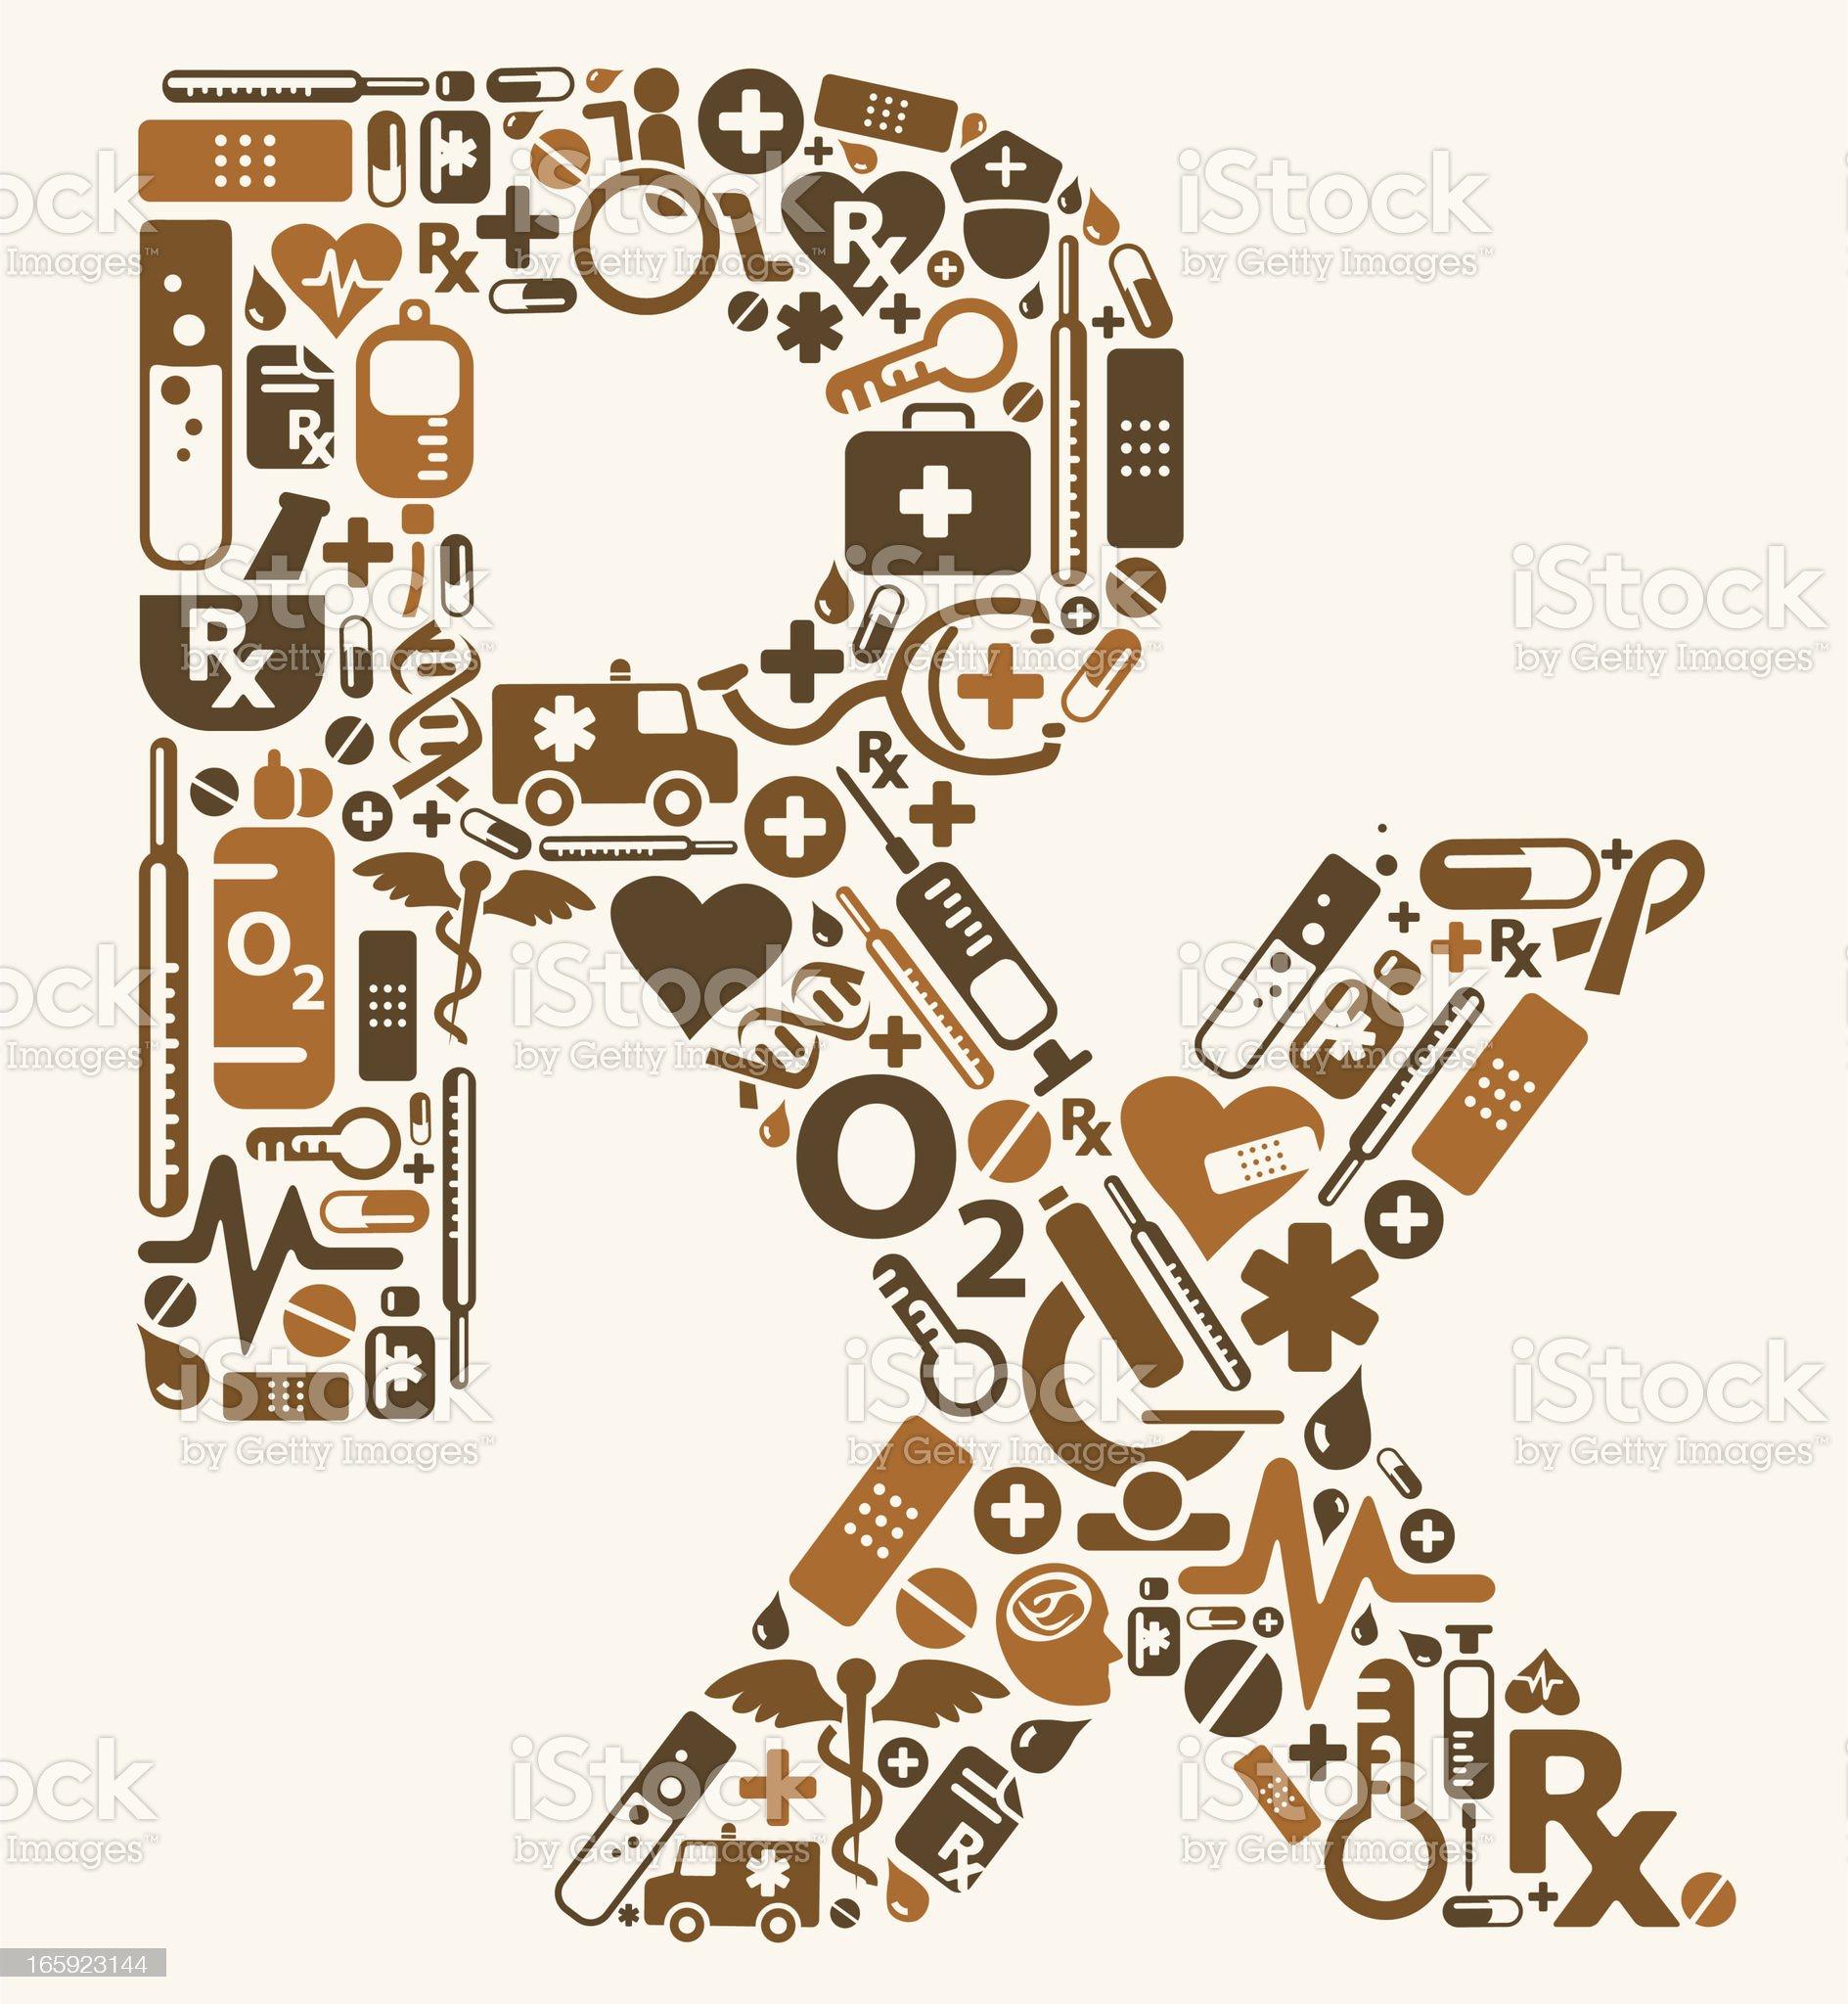 RX symbol using medical icons royalty-free stock vector art